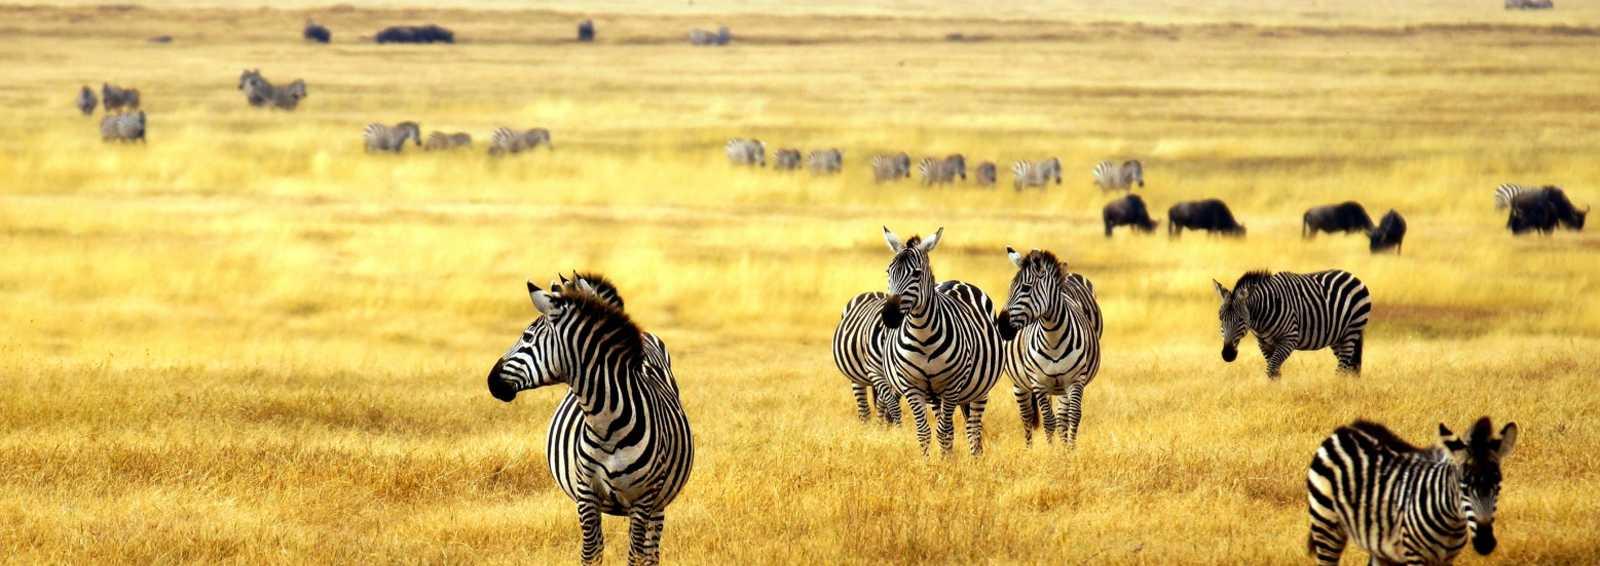 Zebra's in Africa walking on the Serengeti, Tanzania